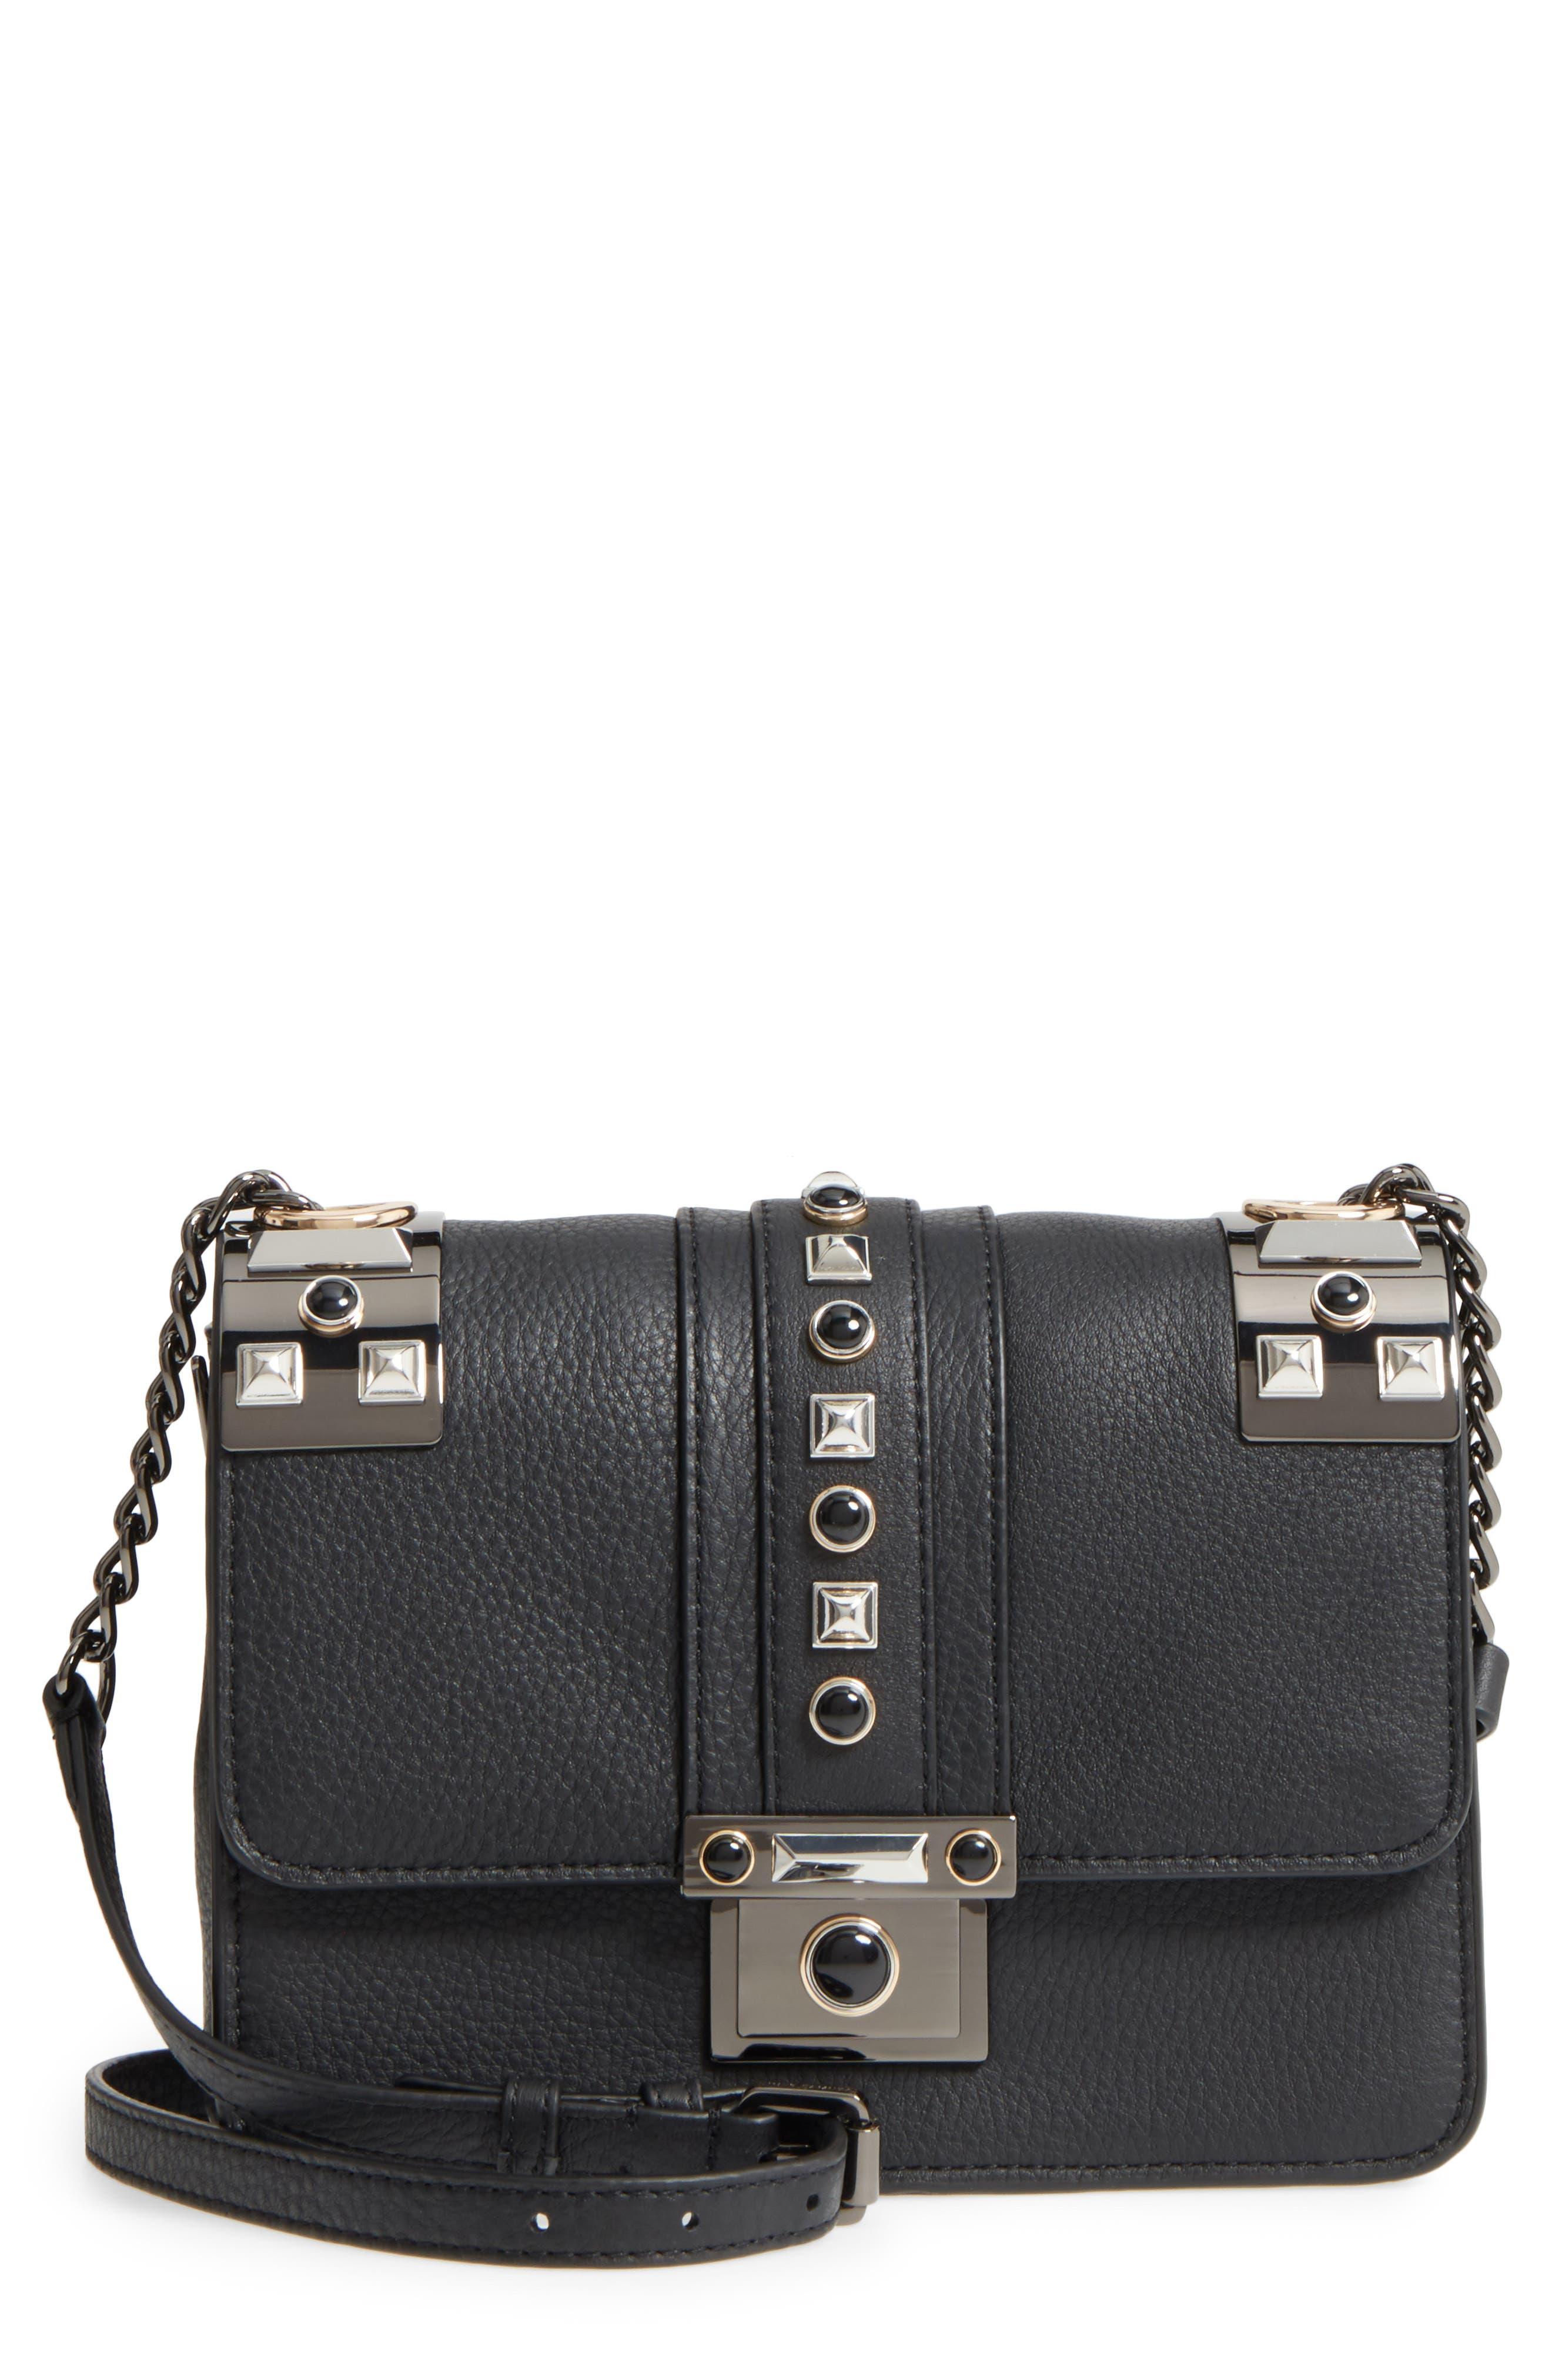 Alternate Image 1 Selected - Vince Camuto Bitty Studded Leather Shoulder Bag